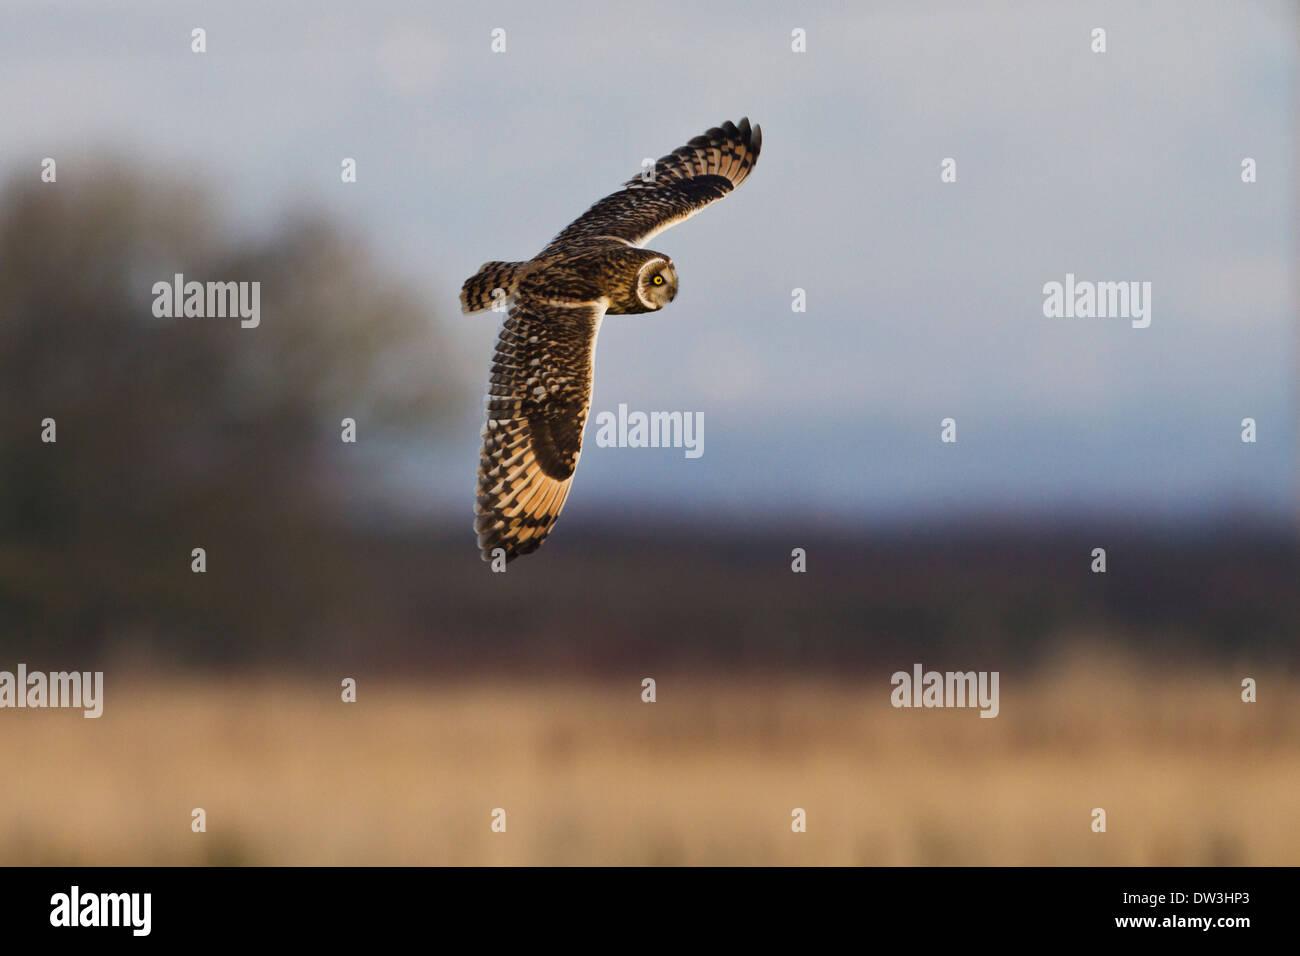 Sumpfohreule (Asio Flammeus) Jagd über grobe Grünland am Pilling Moss, Lancashire. Dezember. Stockfoto